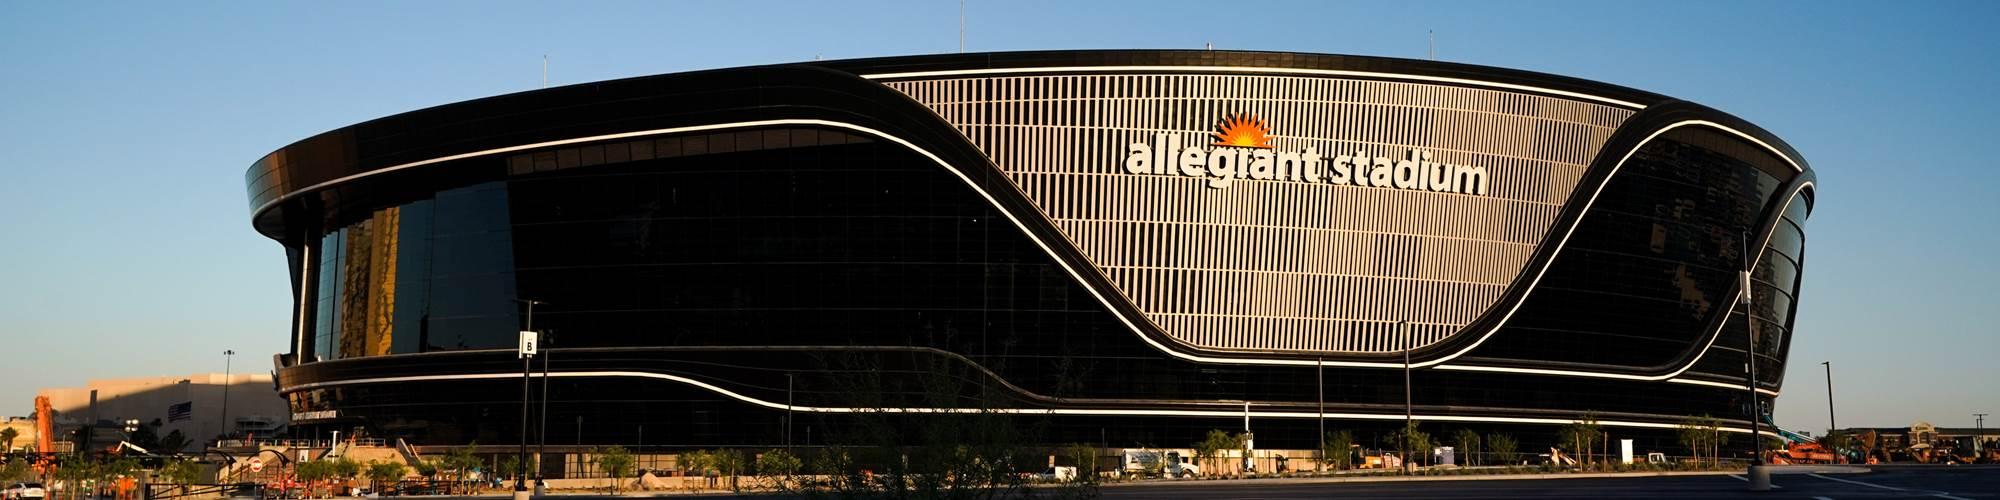 PPG Coatings Used for Raiders' Allegiant Stadium